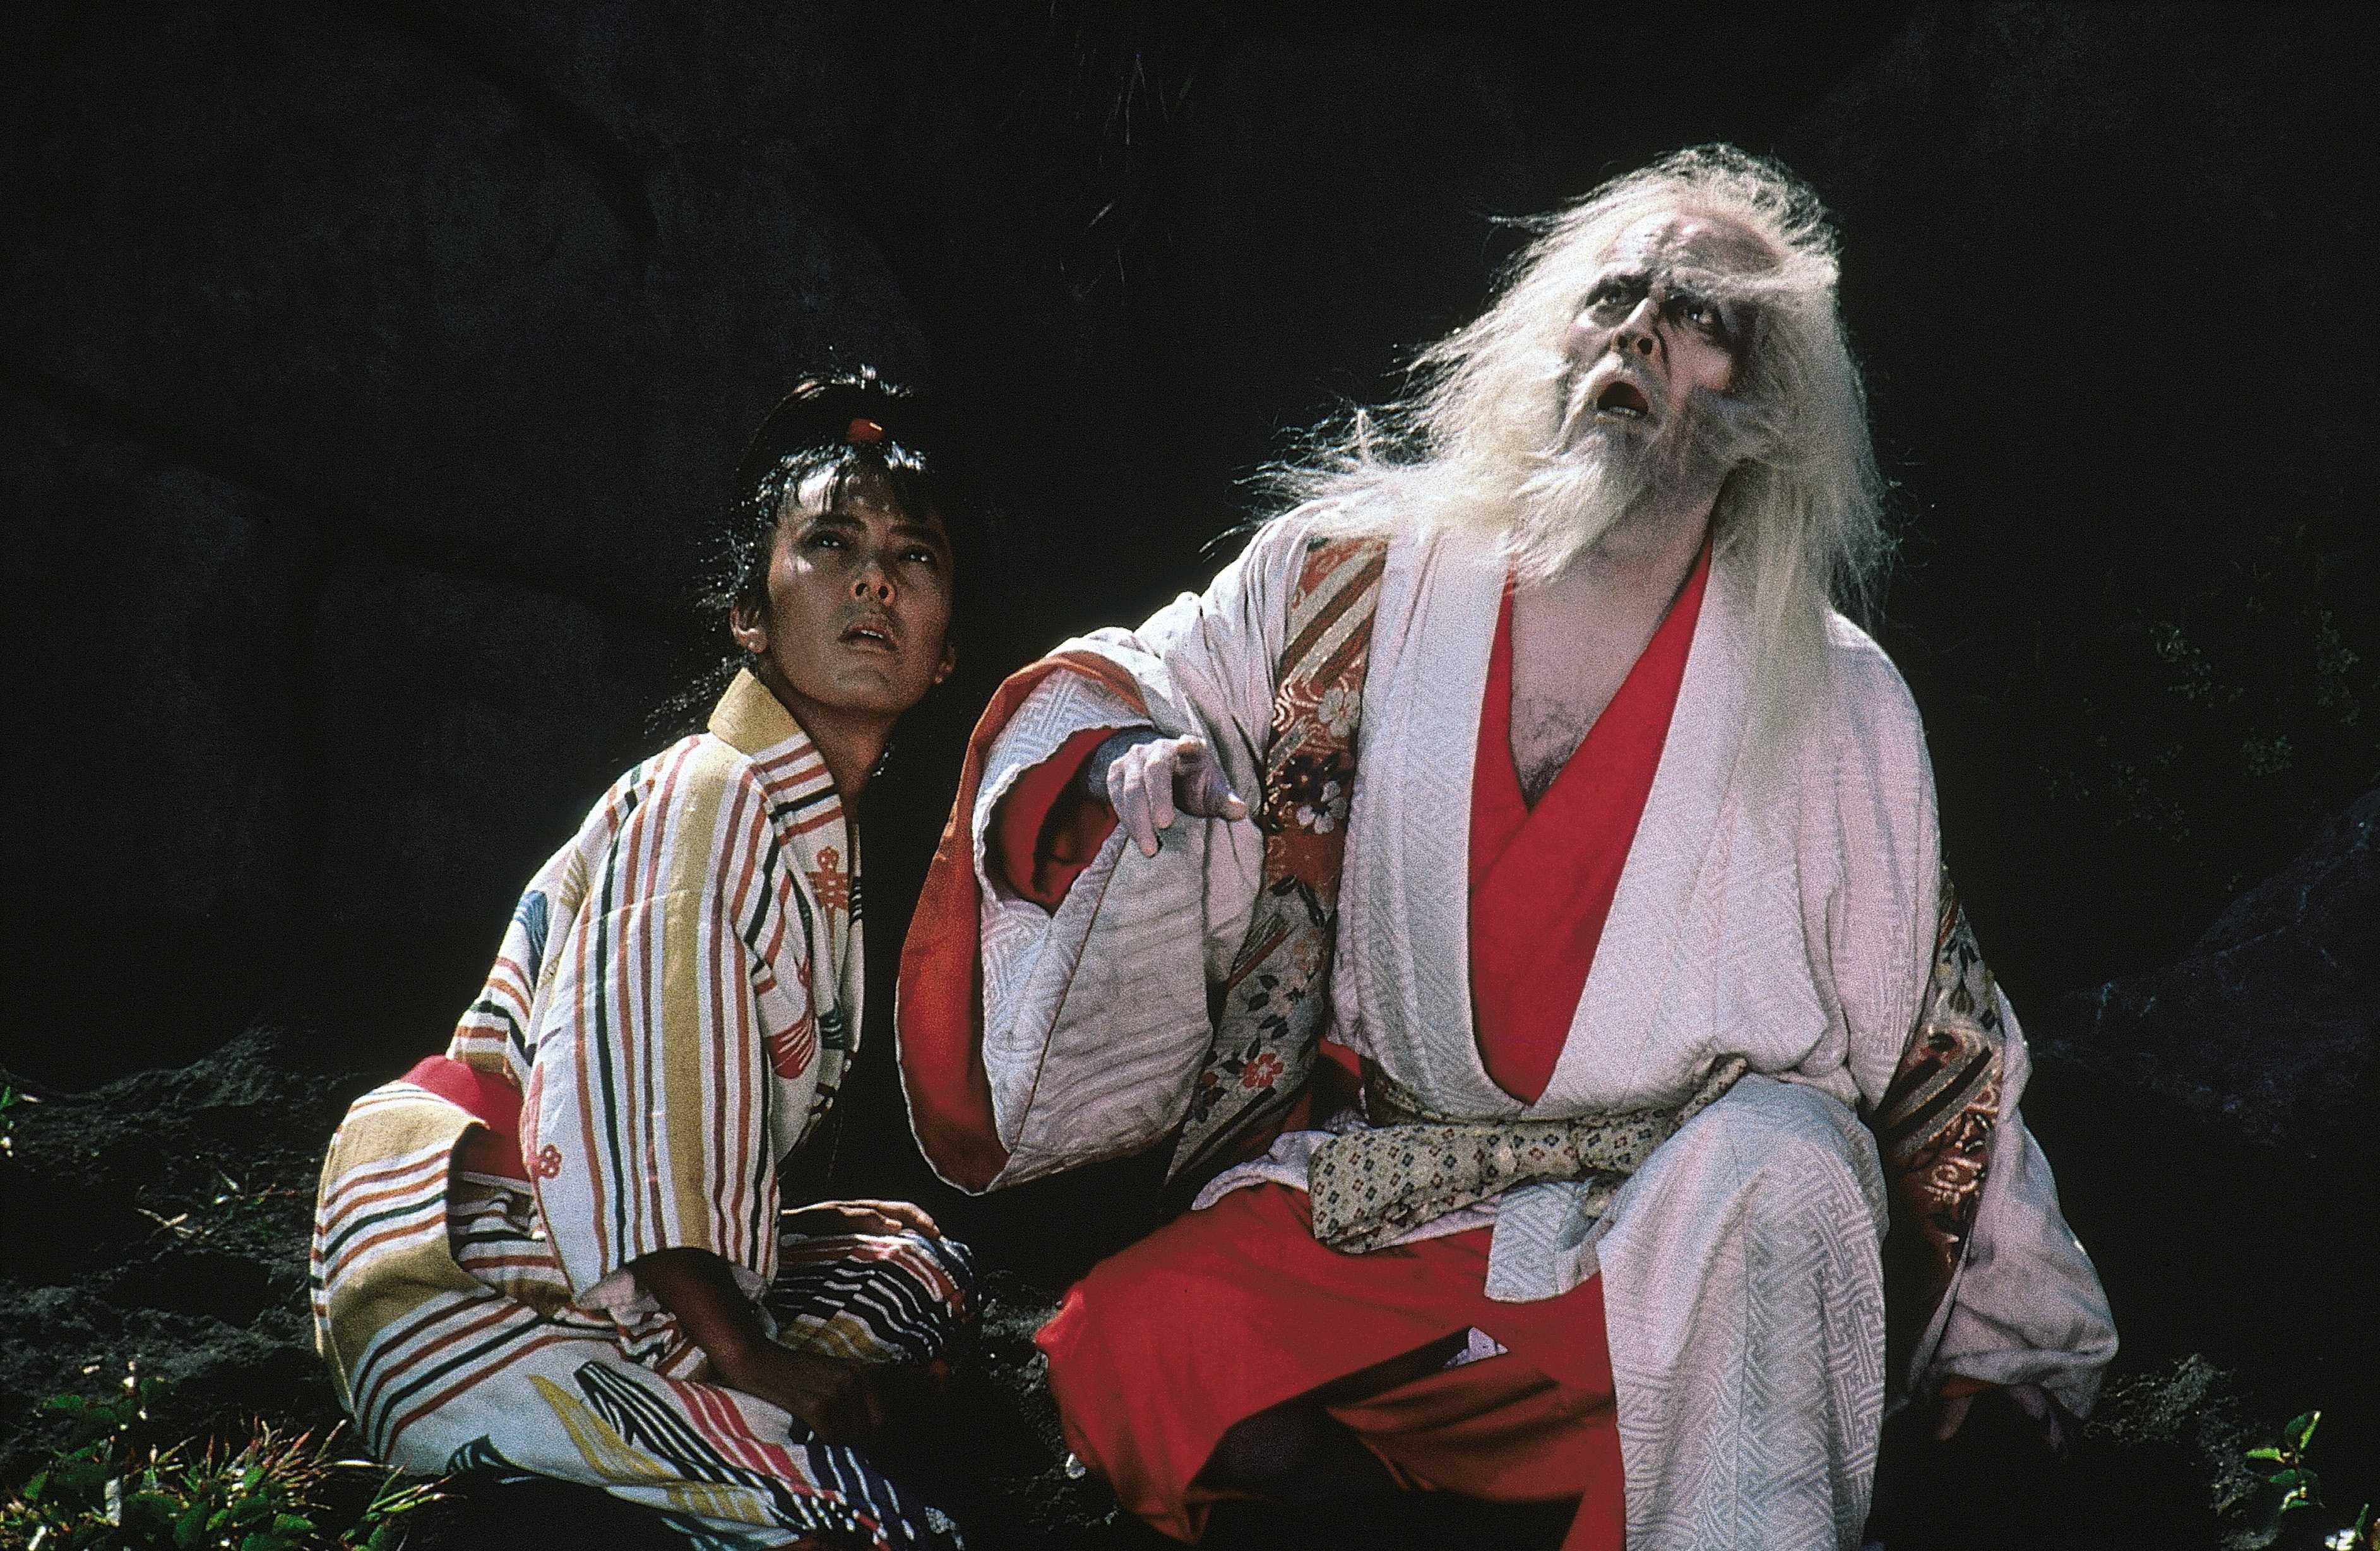 an analysis of shakespearean elements in ran by akira kurosawa Japanese film director akira kurosawa has twice based  kurosawa sets his shakespearean adaptation ran,  the japanese data used for the analysis of .